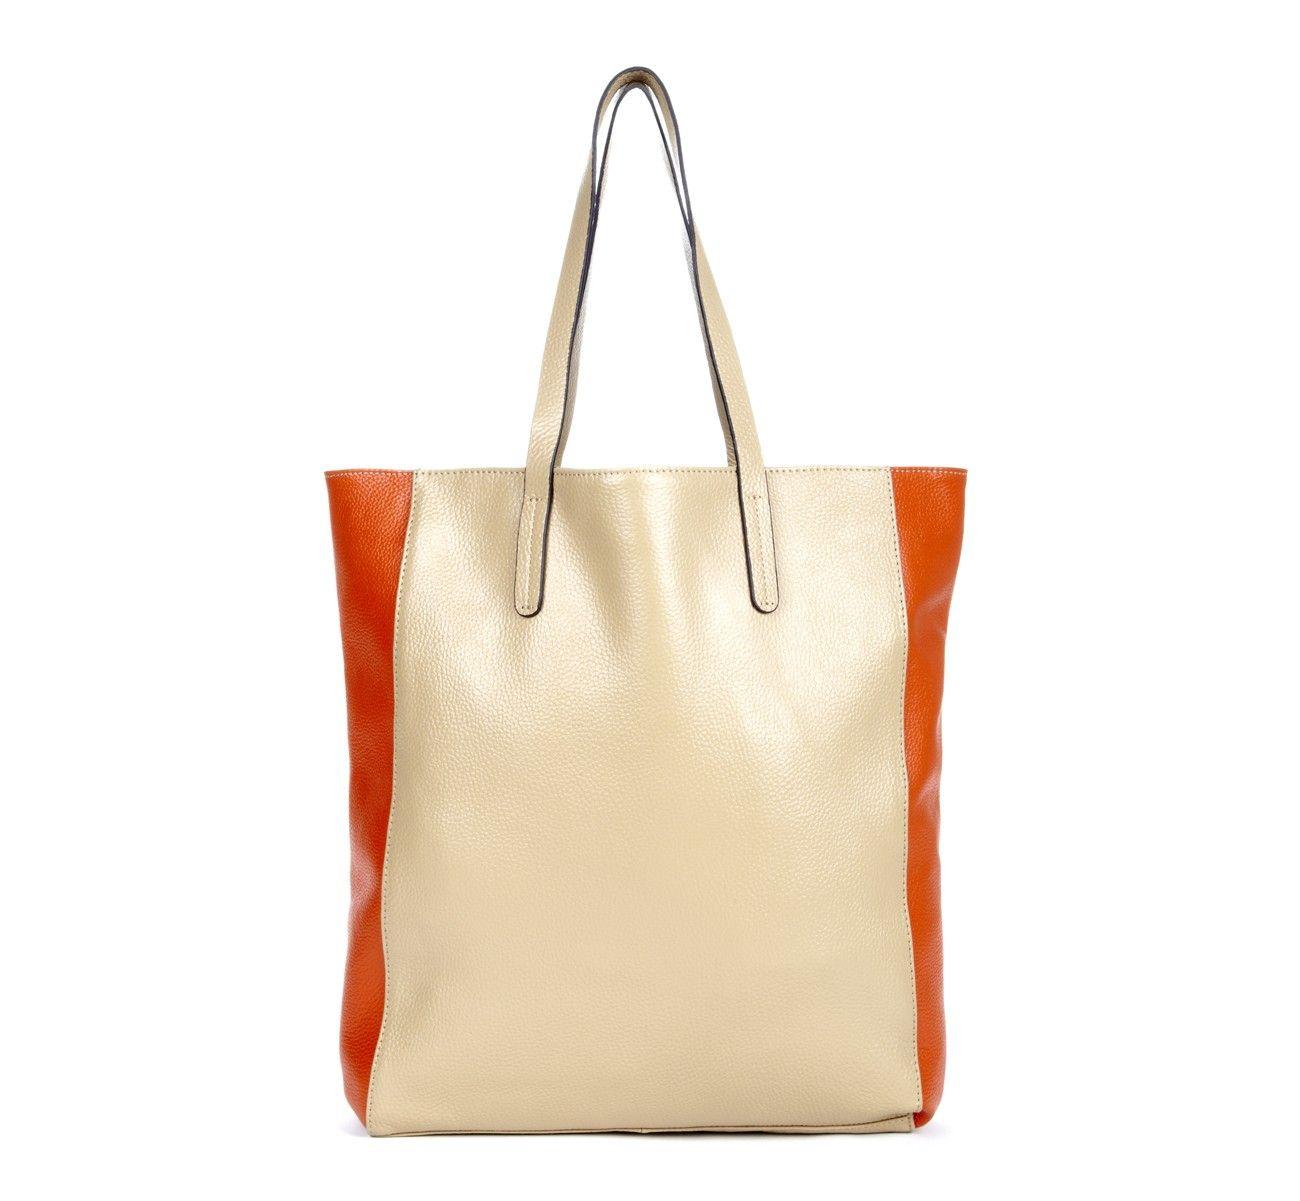 white and orange leather tote or shopper.